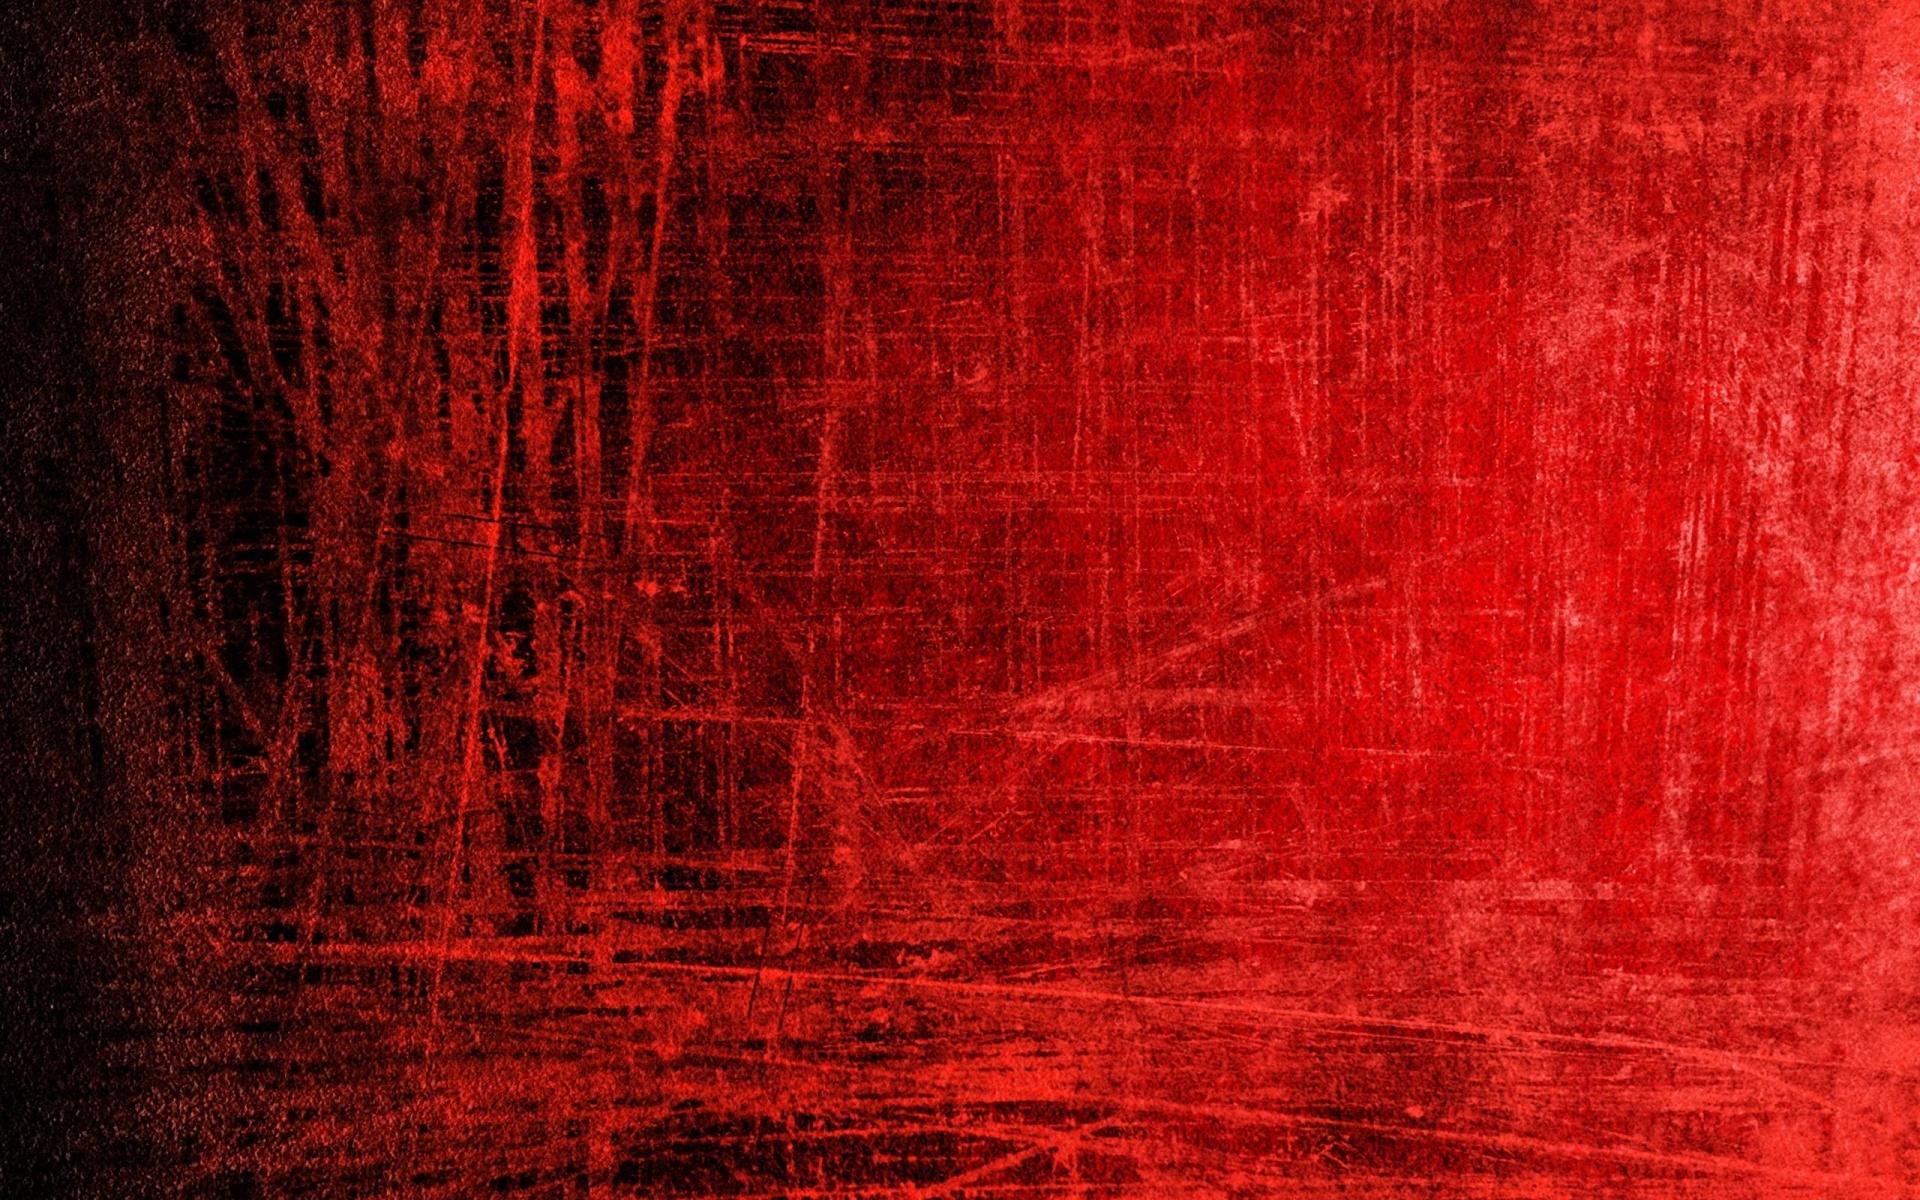 Red backgrounds design wallpaper wallpaper hd background desktop 1920x1200